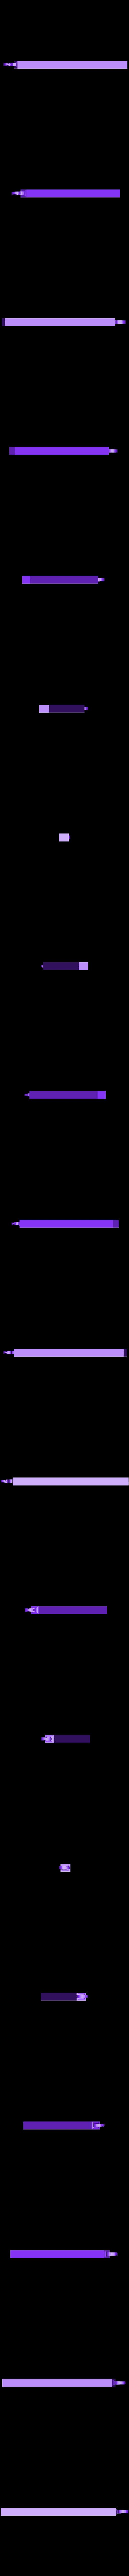 leg.stl Download free STL file Hangman Game • 3D printable design, M3Dr